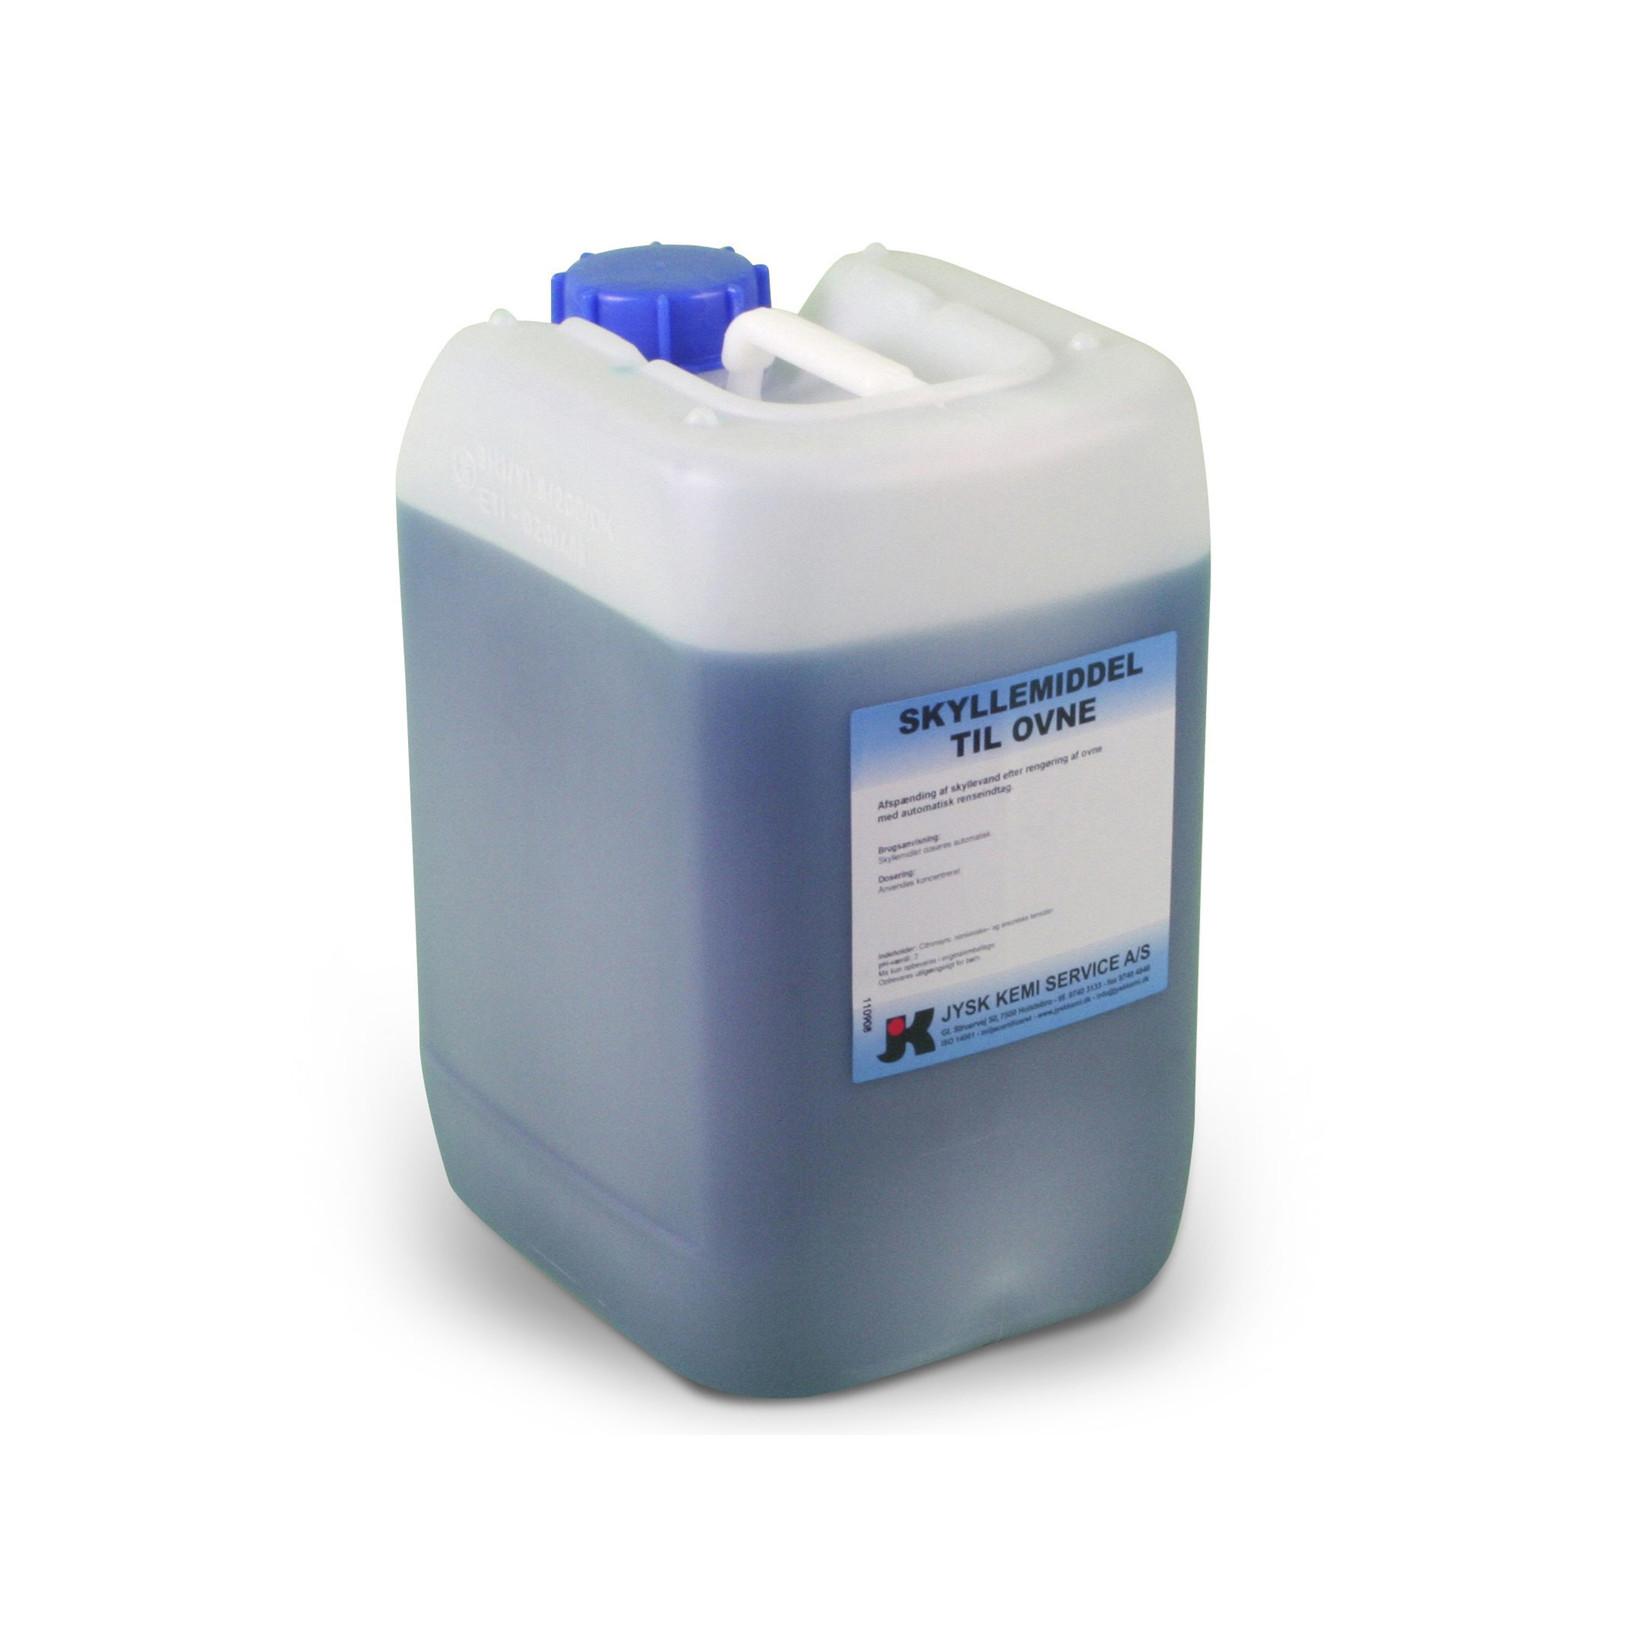 Cleanline Skyllemiddel til Ovne - 10 liter